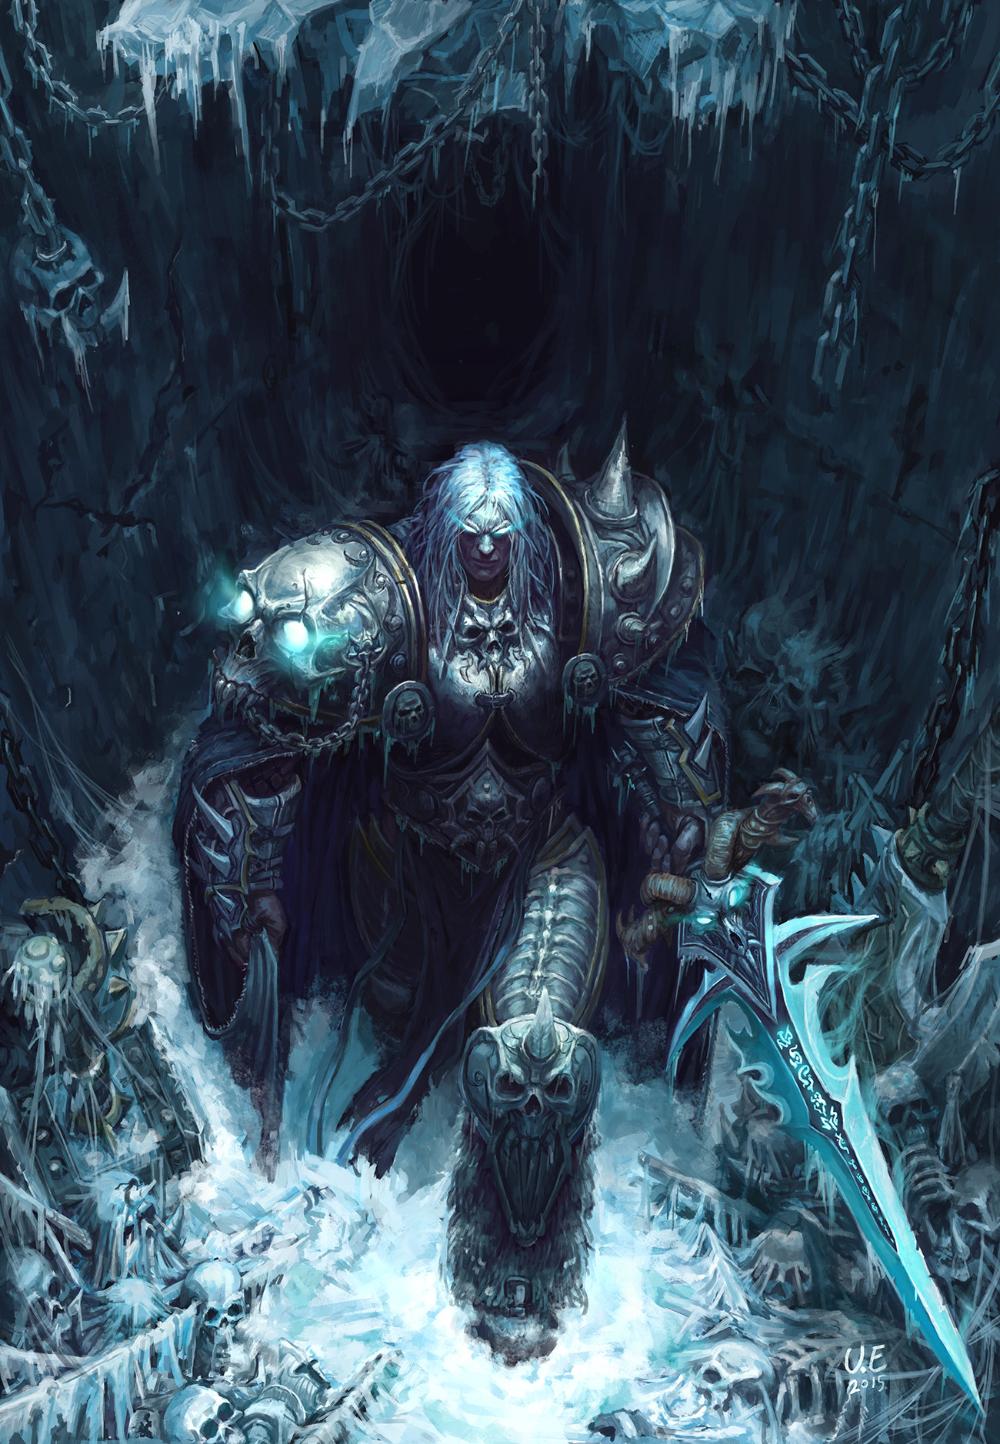 Artstation Lich King Arthas Younghun Byun Warcraft Art Warcraft Iii Lich King